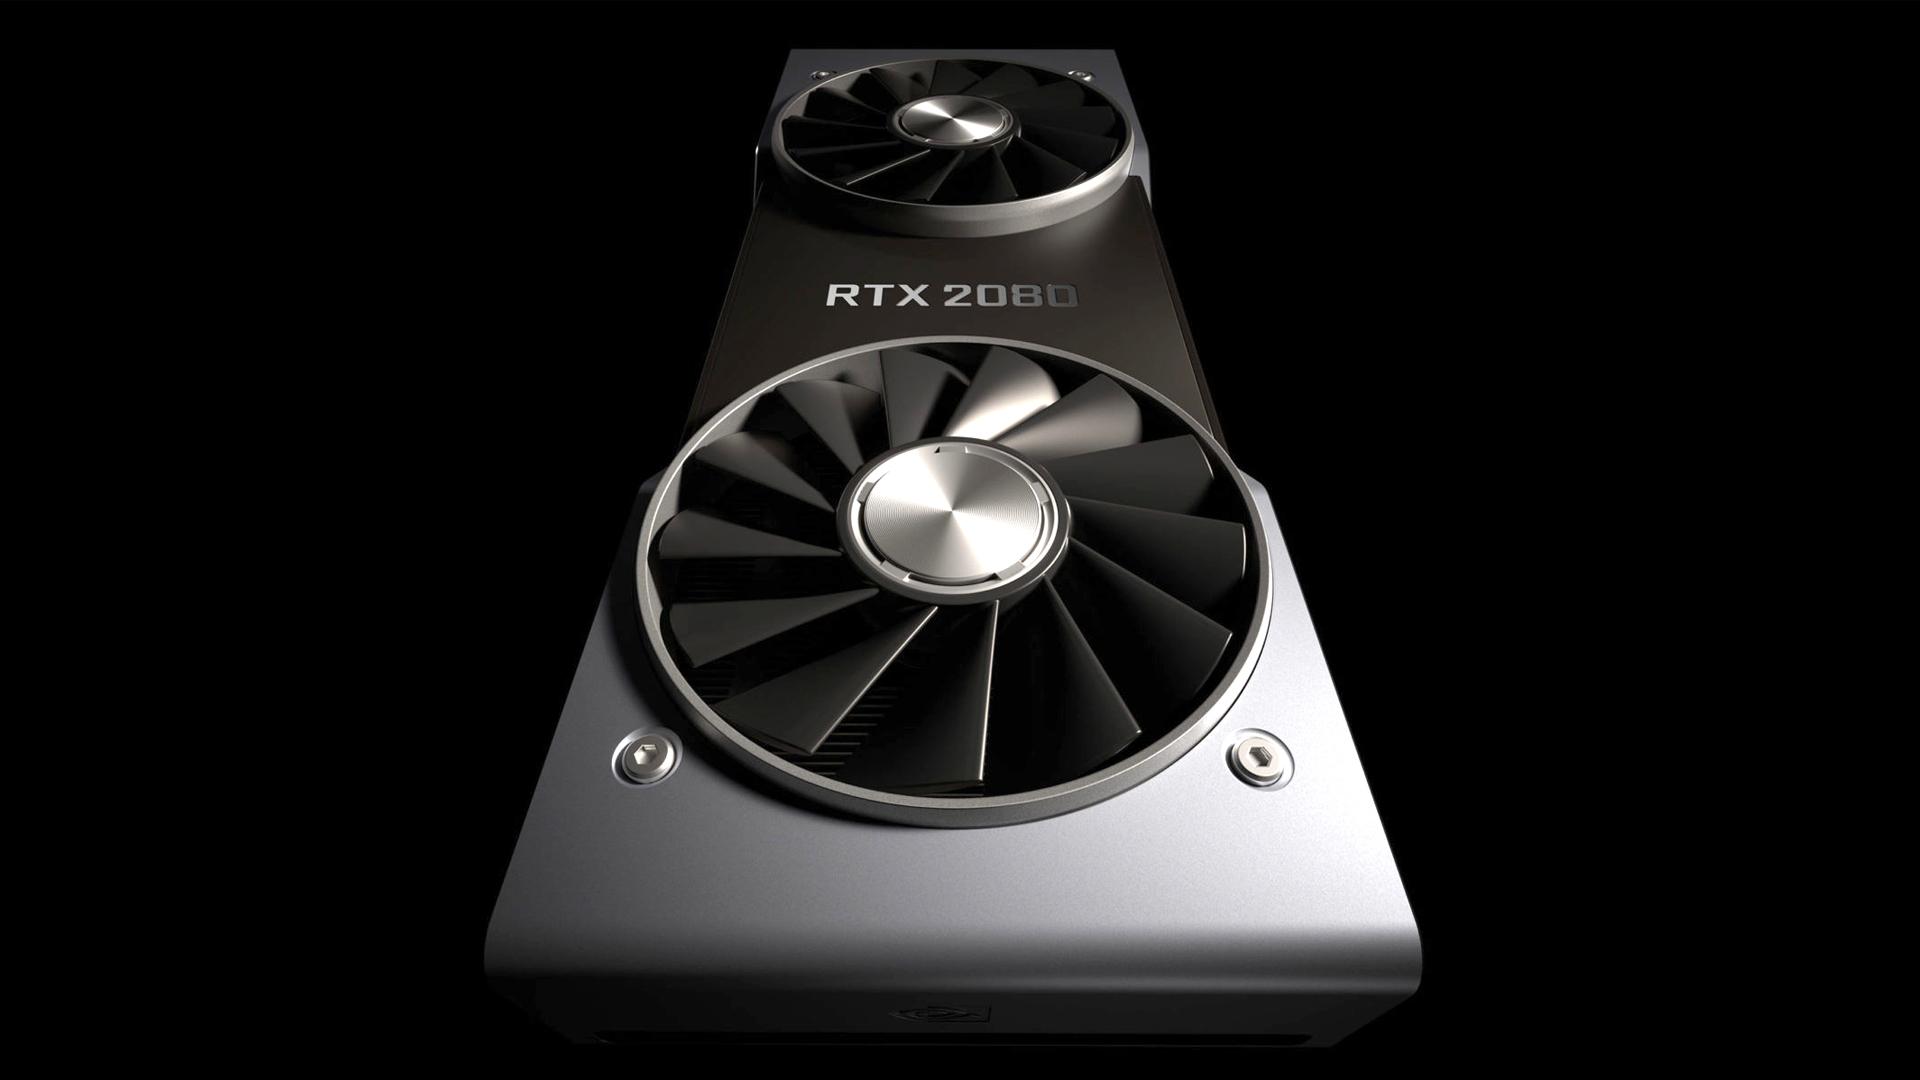 NVIDIA GeForce RTX 2080 Graphics Card